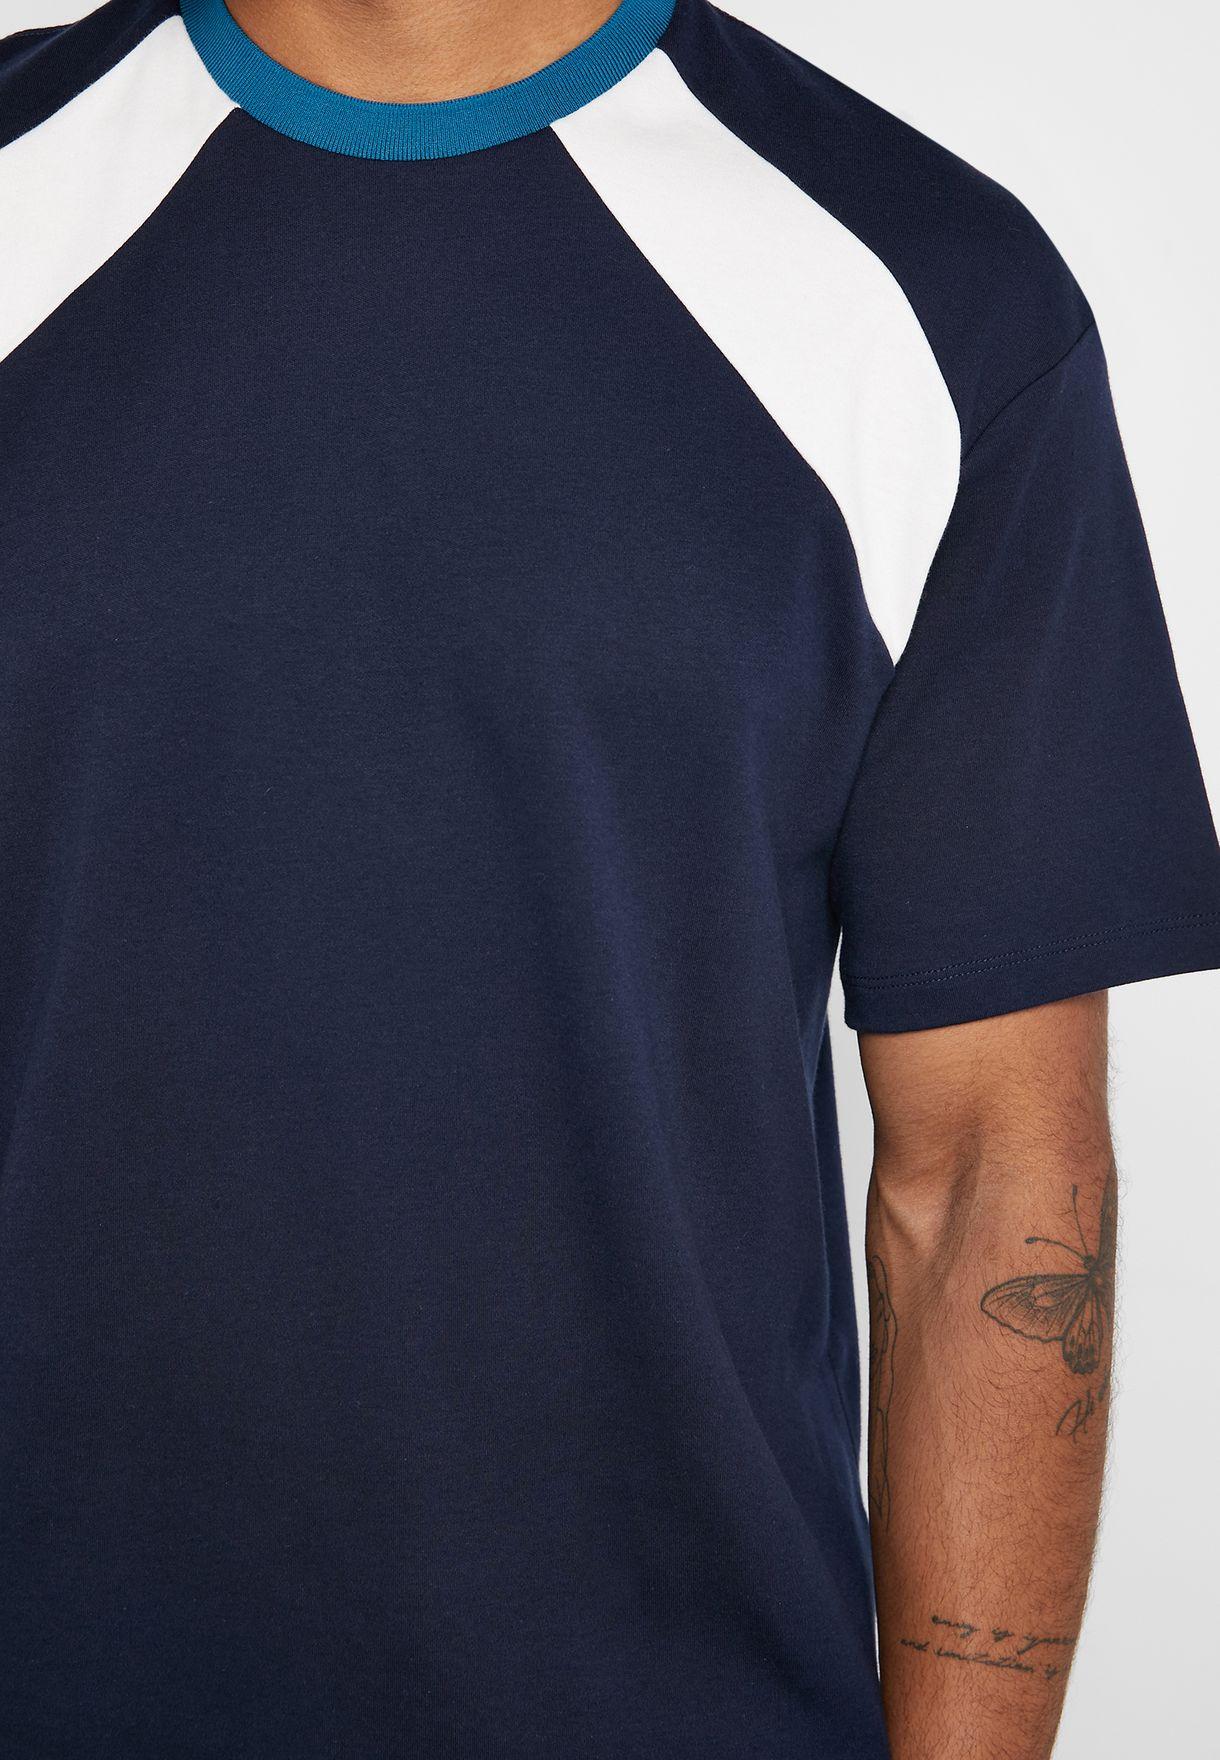 Ethan Panel Intlock Crew Neck T-Shirt